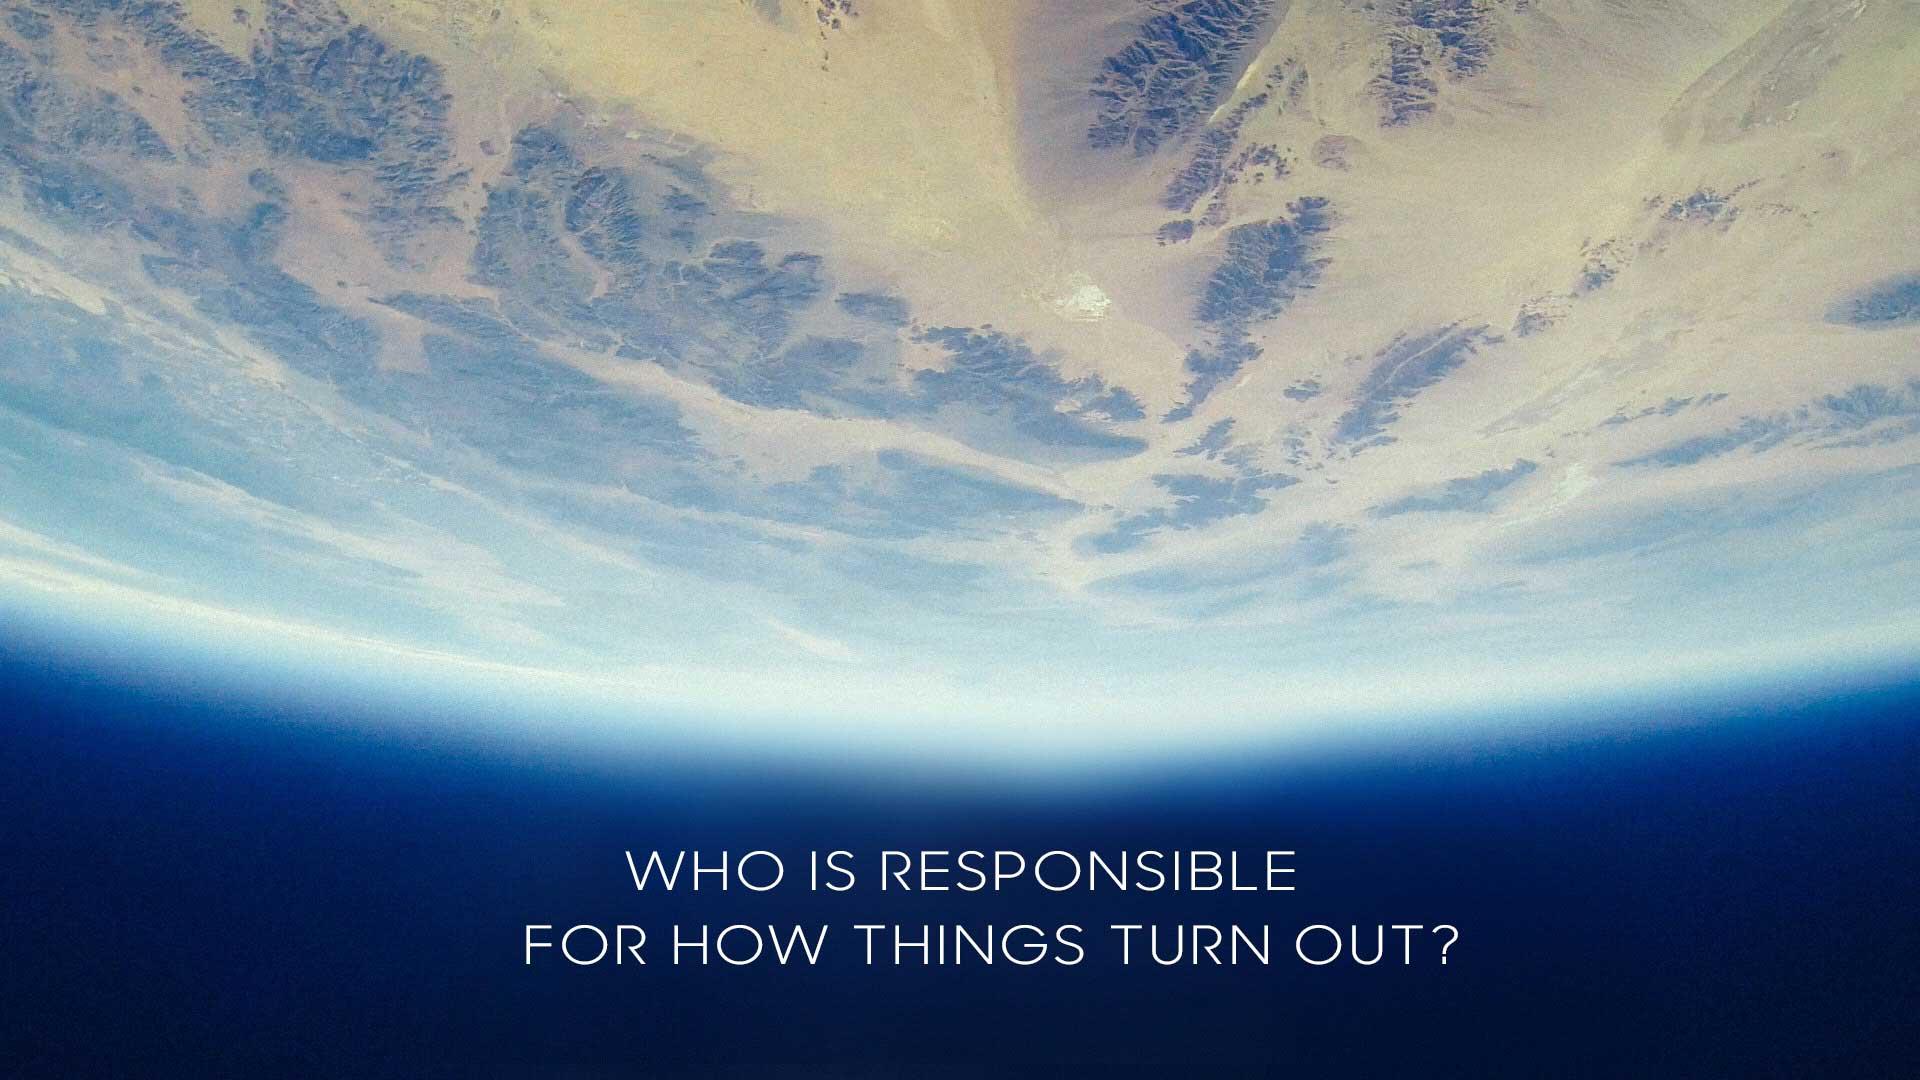 whoisresponsible5.jpg